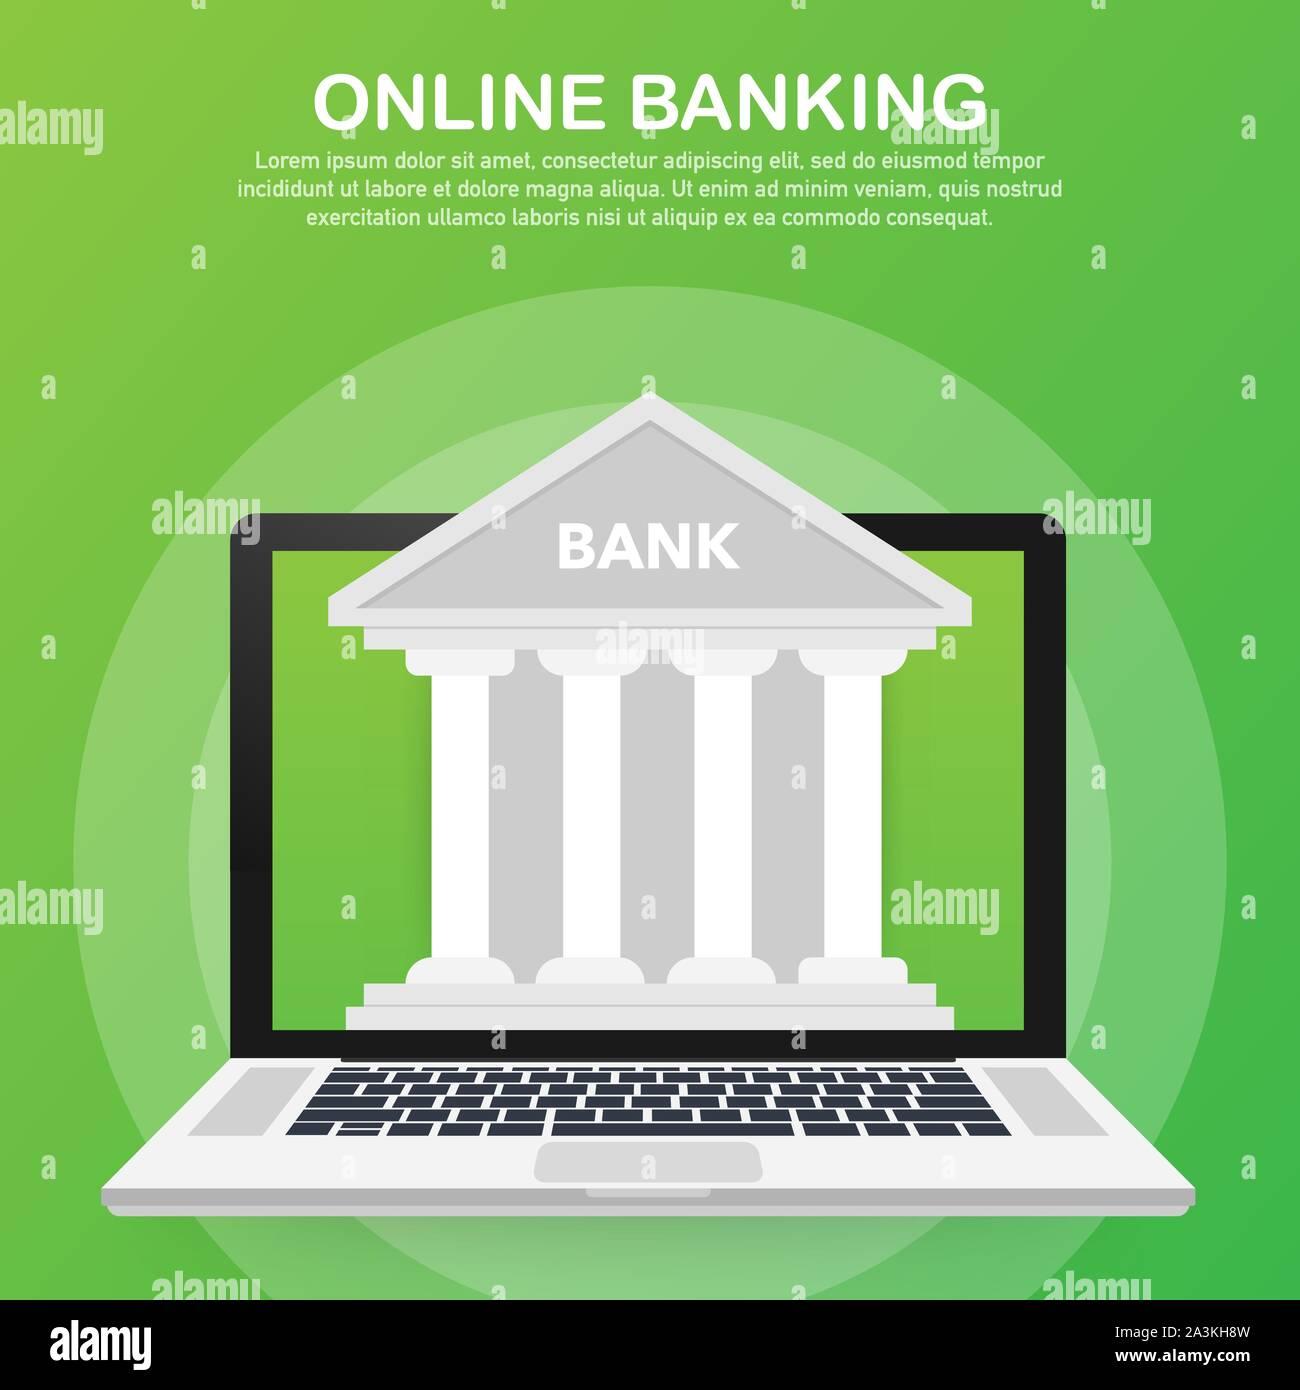 Web Concept For Online Banking Modern Banner For Internet Banking Vector Stock Illustration Stock Vector Image Art Alamy